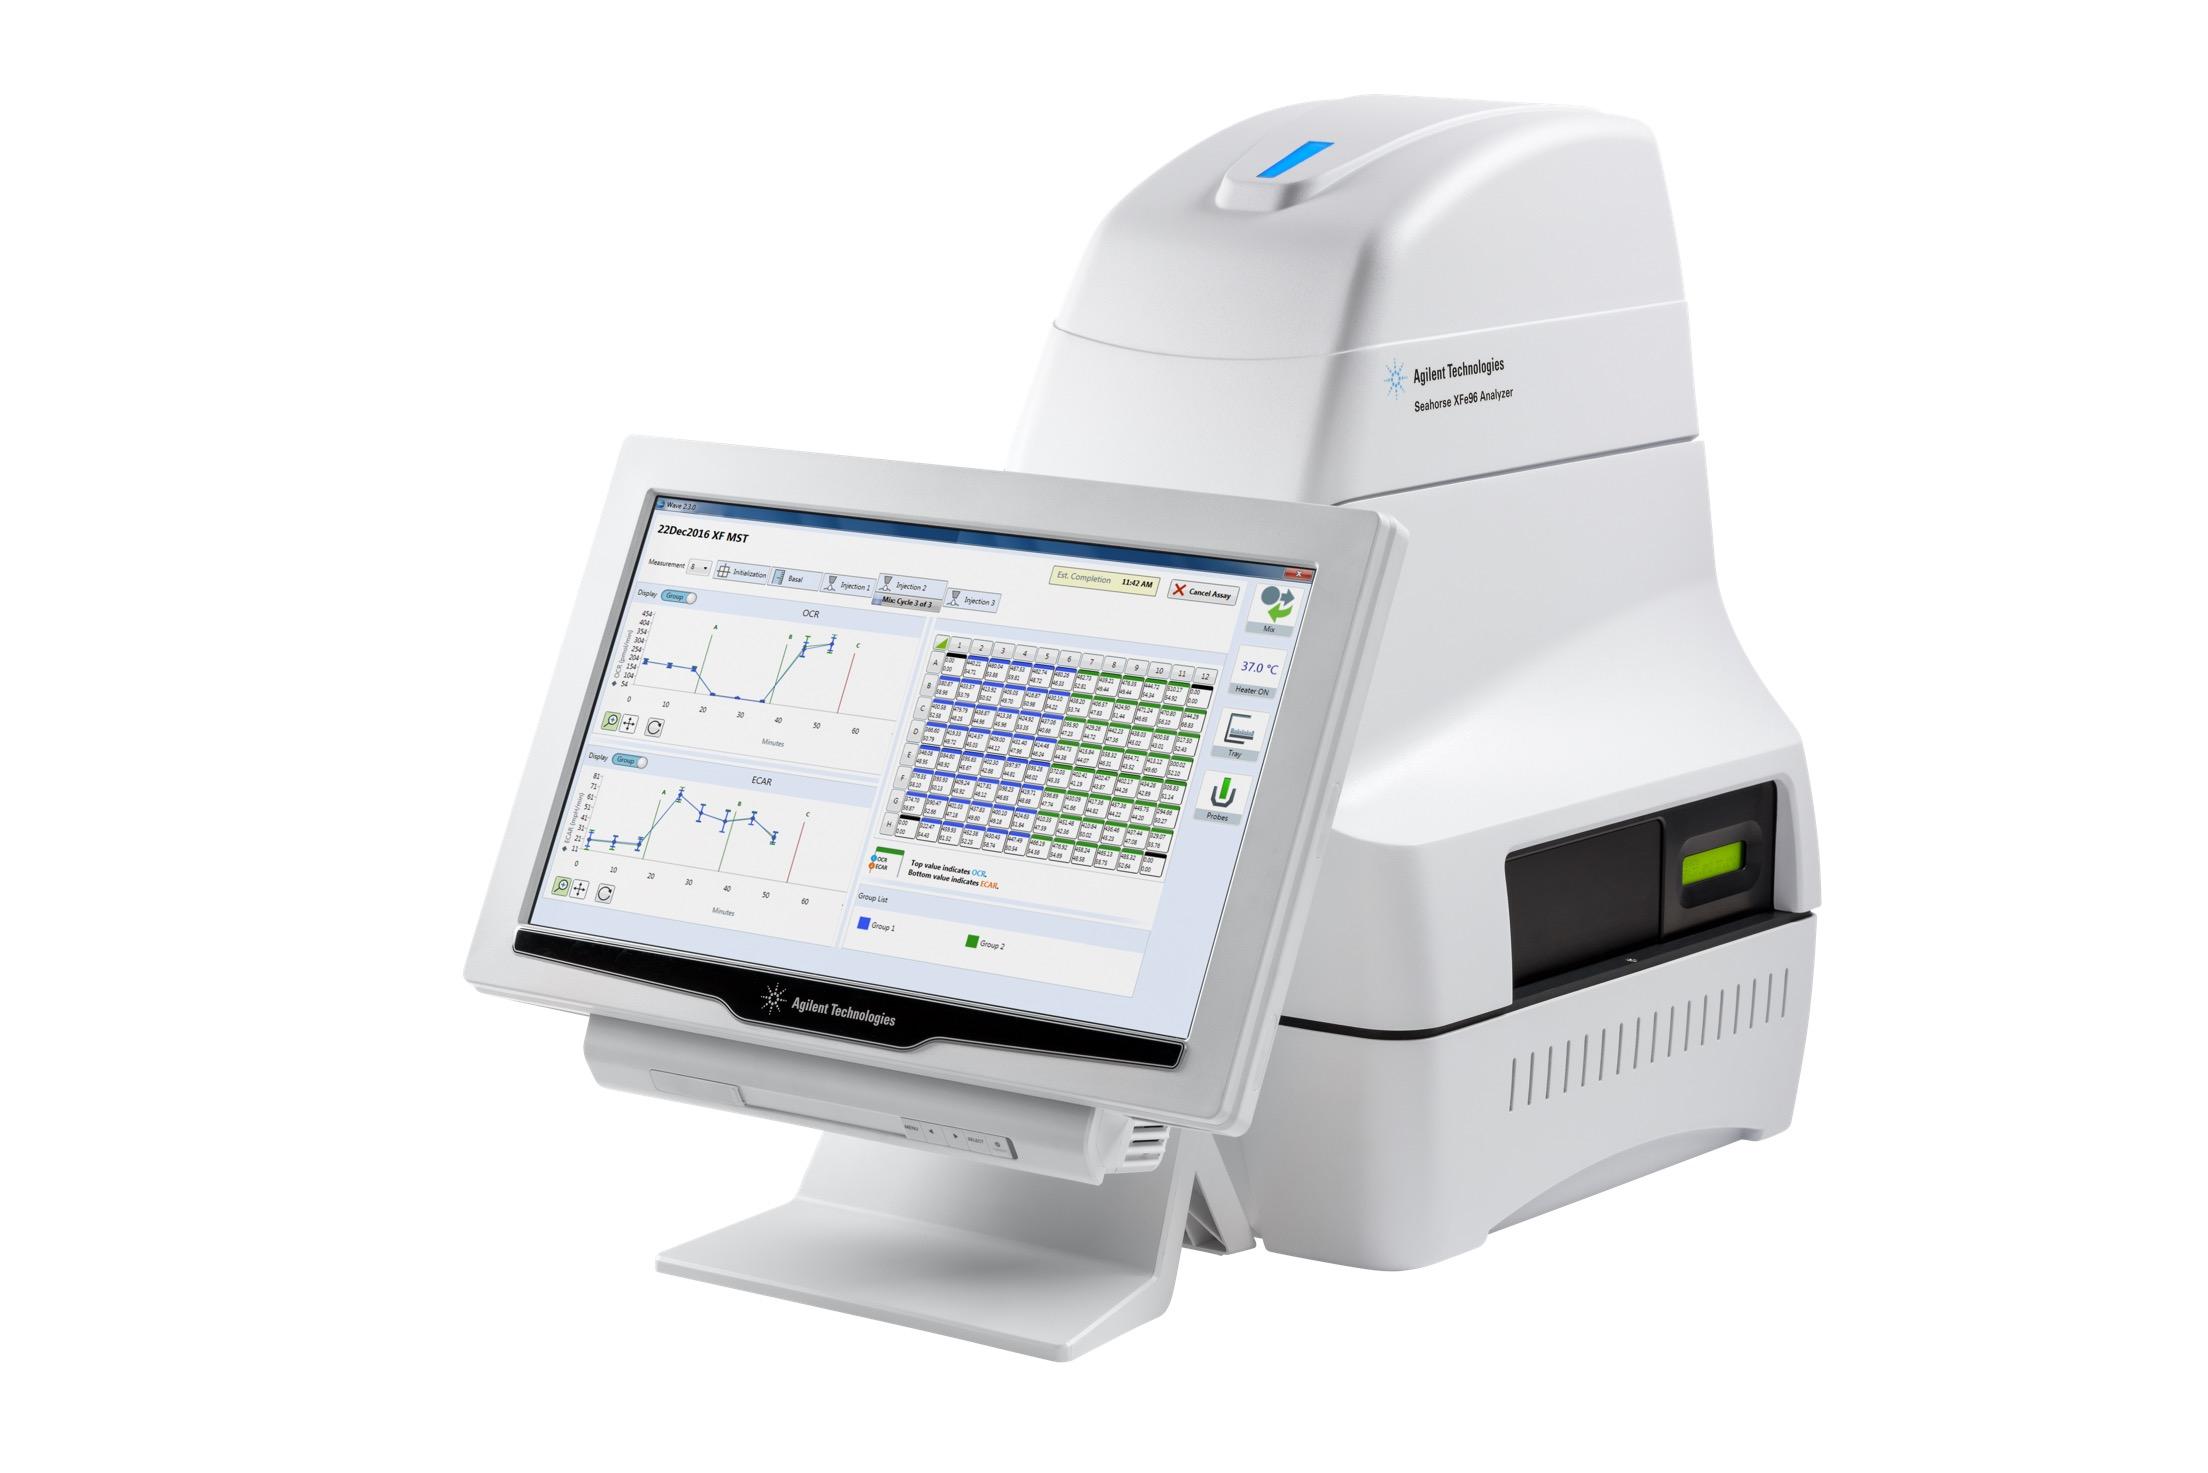 安捷伦Seahorse细胞分析仪 XFe96